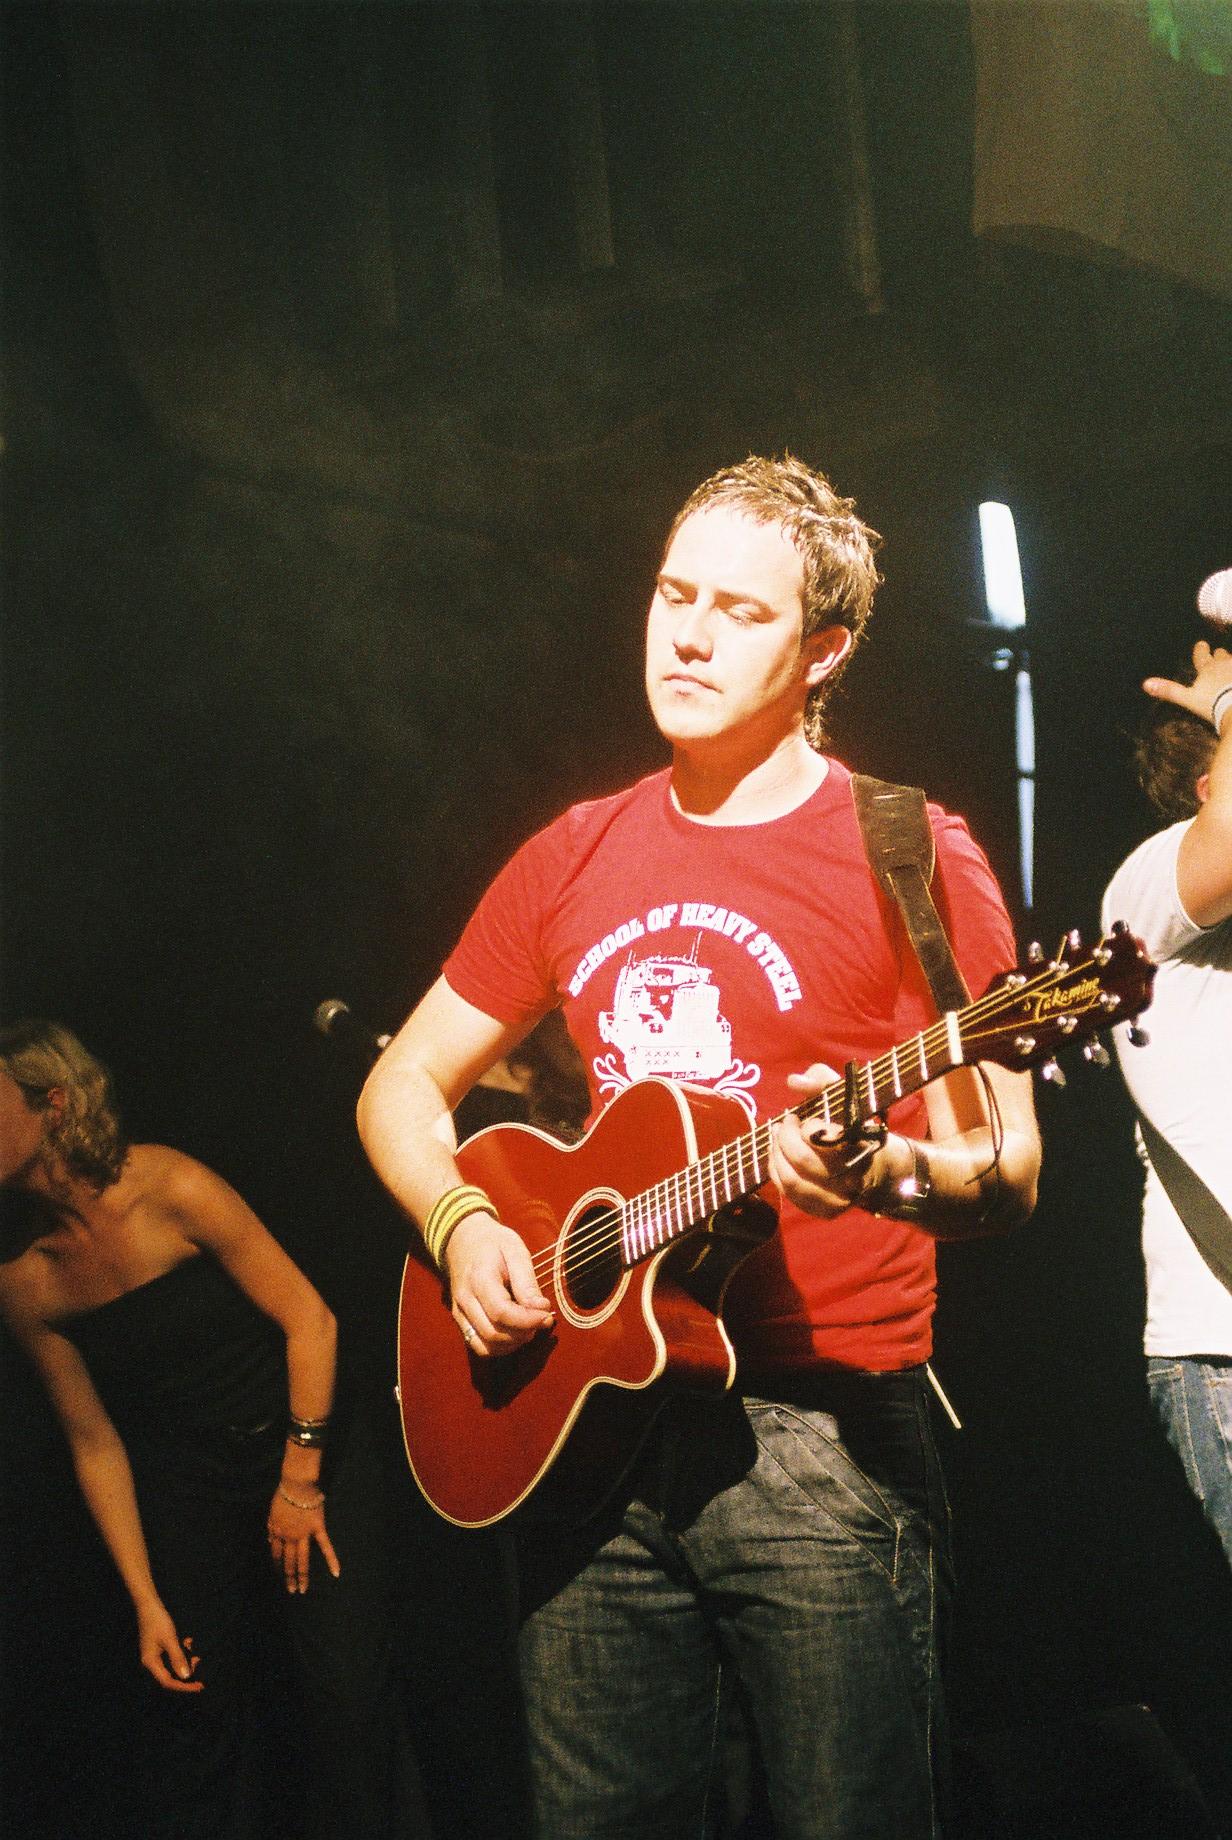 Dean Gardner - The Dees - Showcase - Union Chapel 2004, Islington